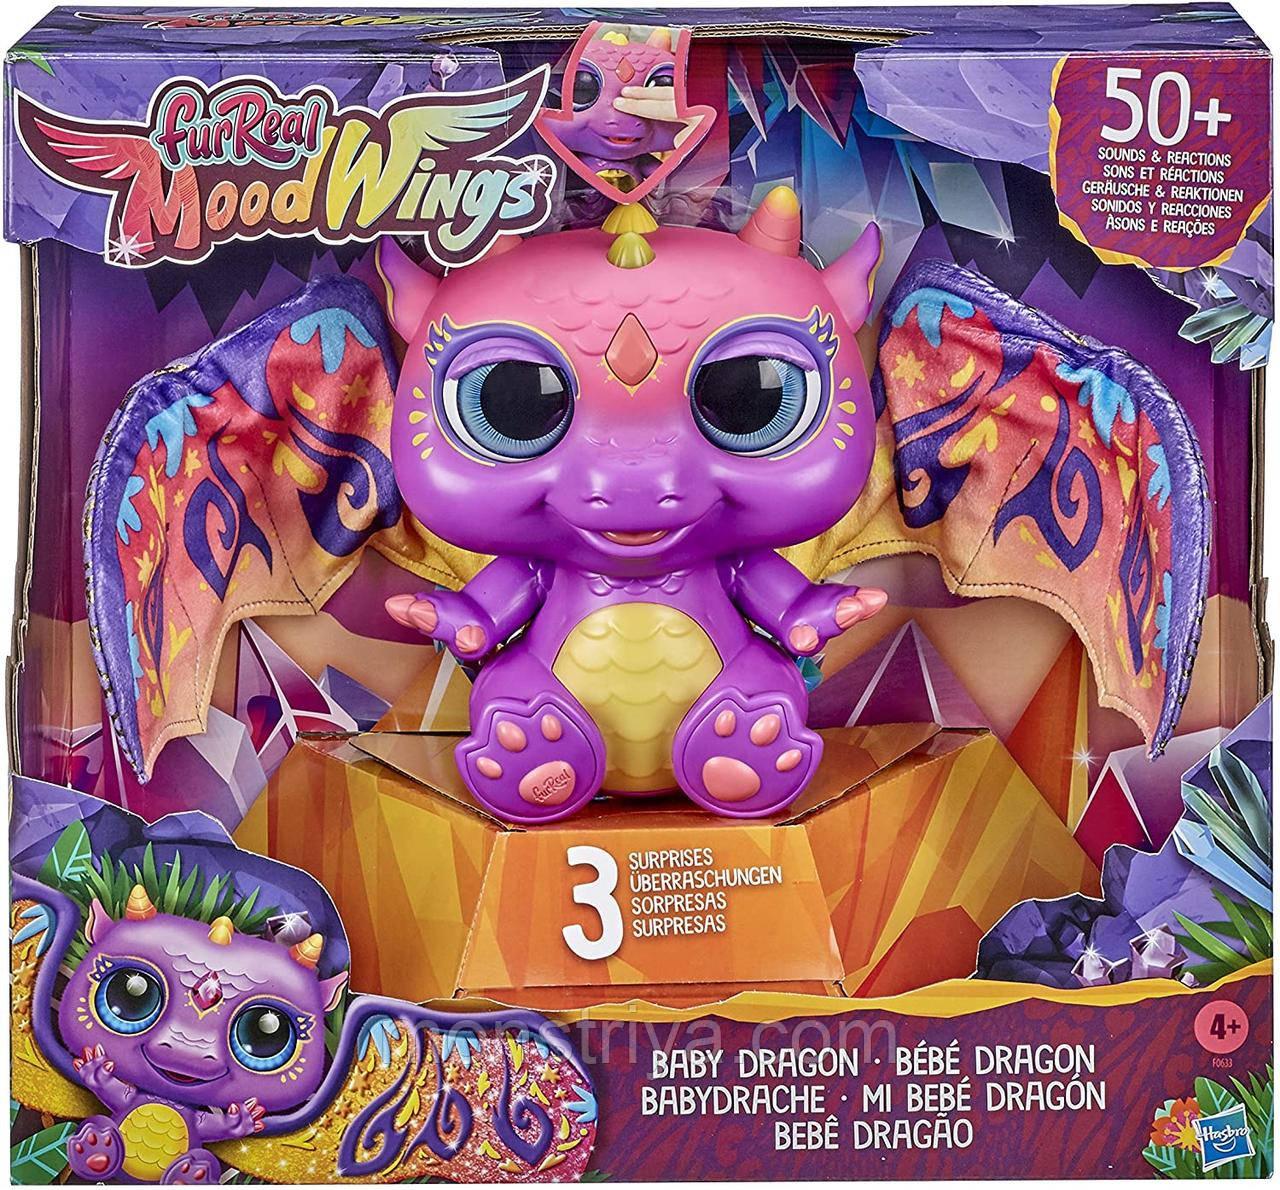 Інтерактивний Малюк дракон FurReal Friends Moodwings Baby Hasbro Dragon